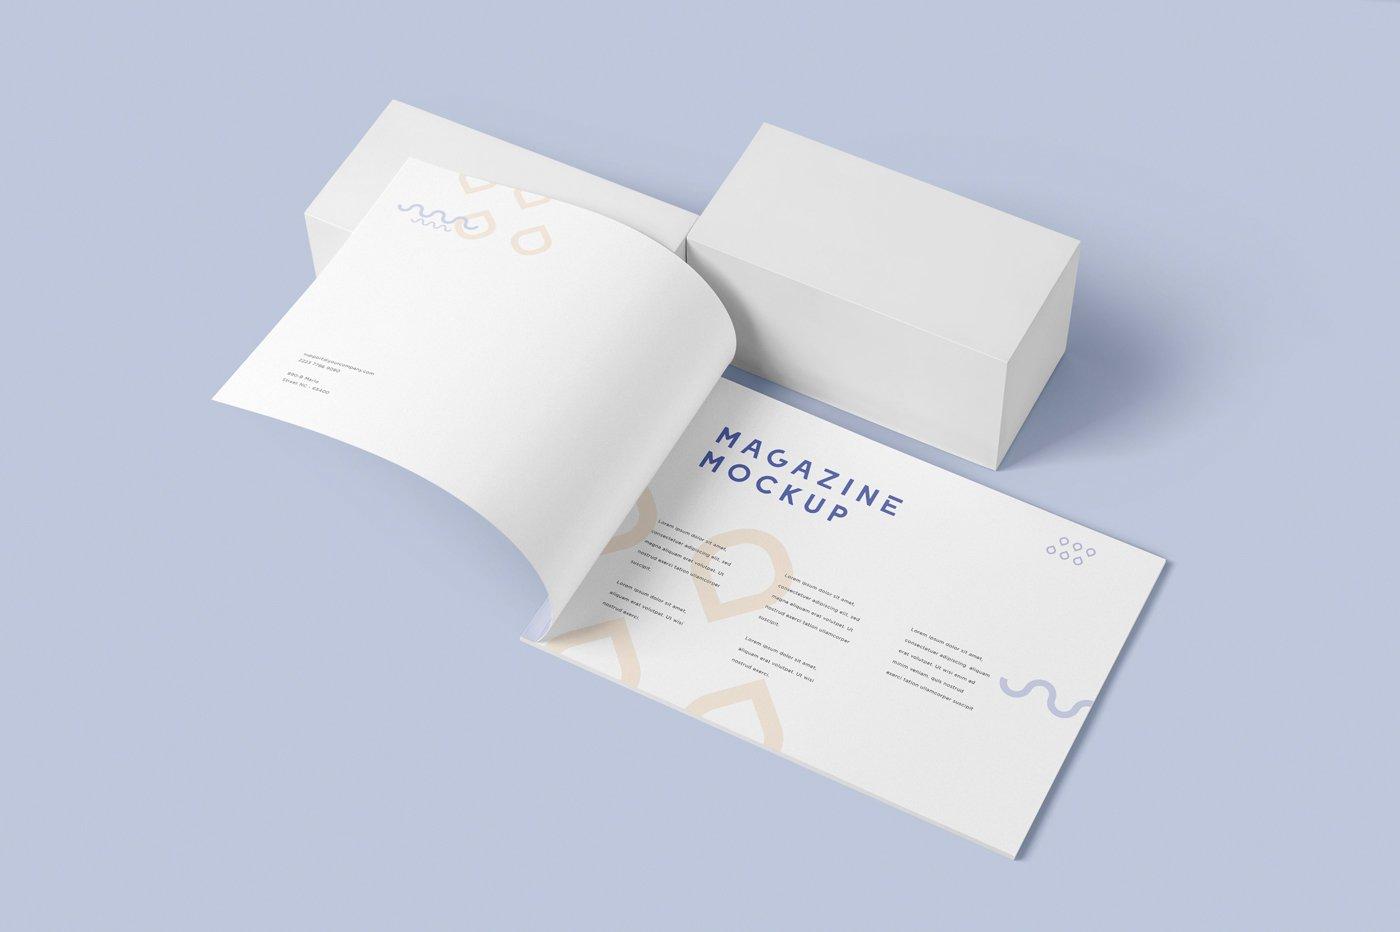 A4横版宣传画册设计展示样机 A4 Horizontal Brochure Mockups插图(1)